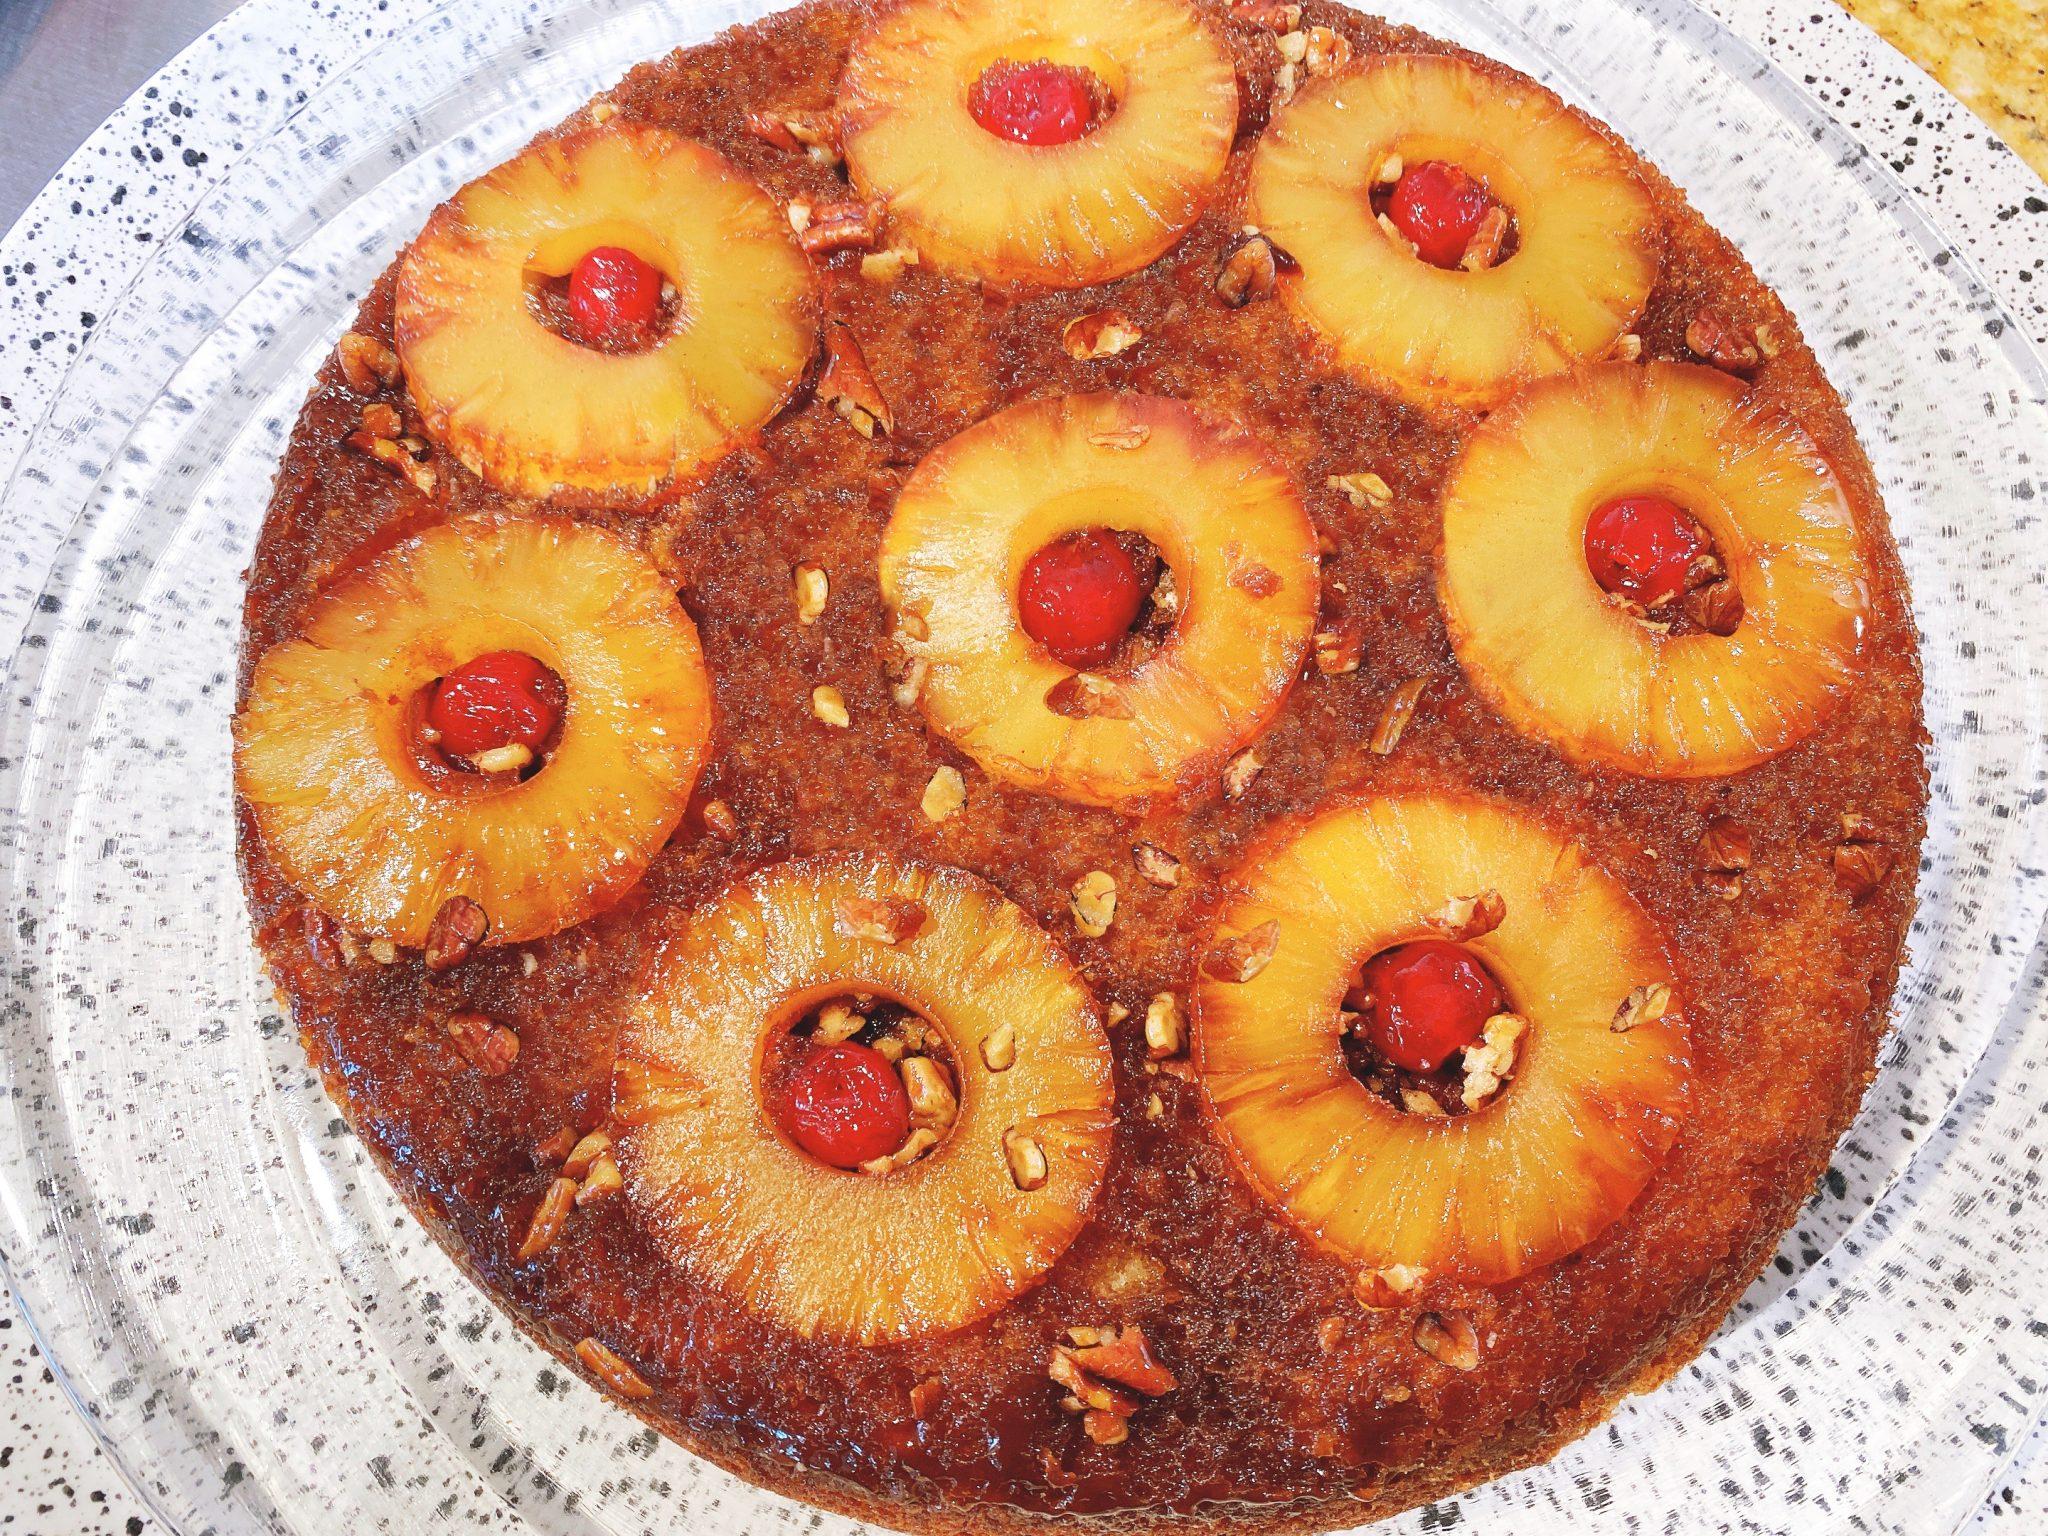 Bourbon Pineapple Upside Down Cake Recipe